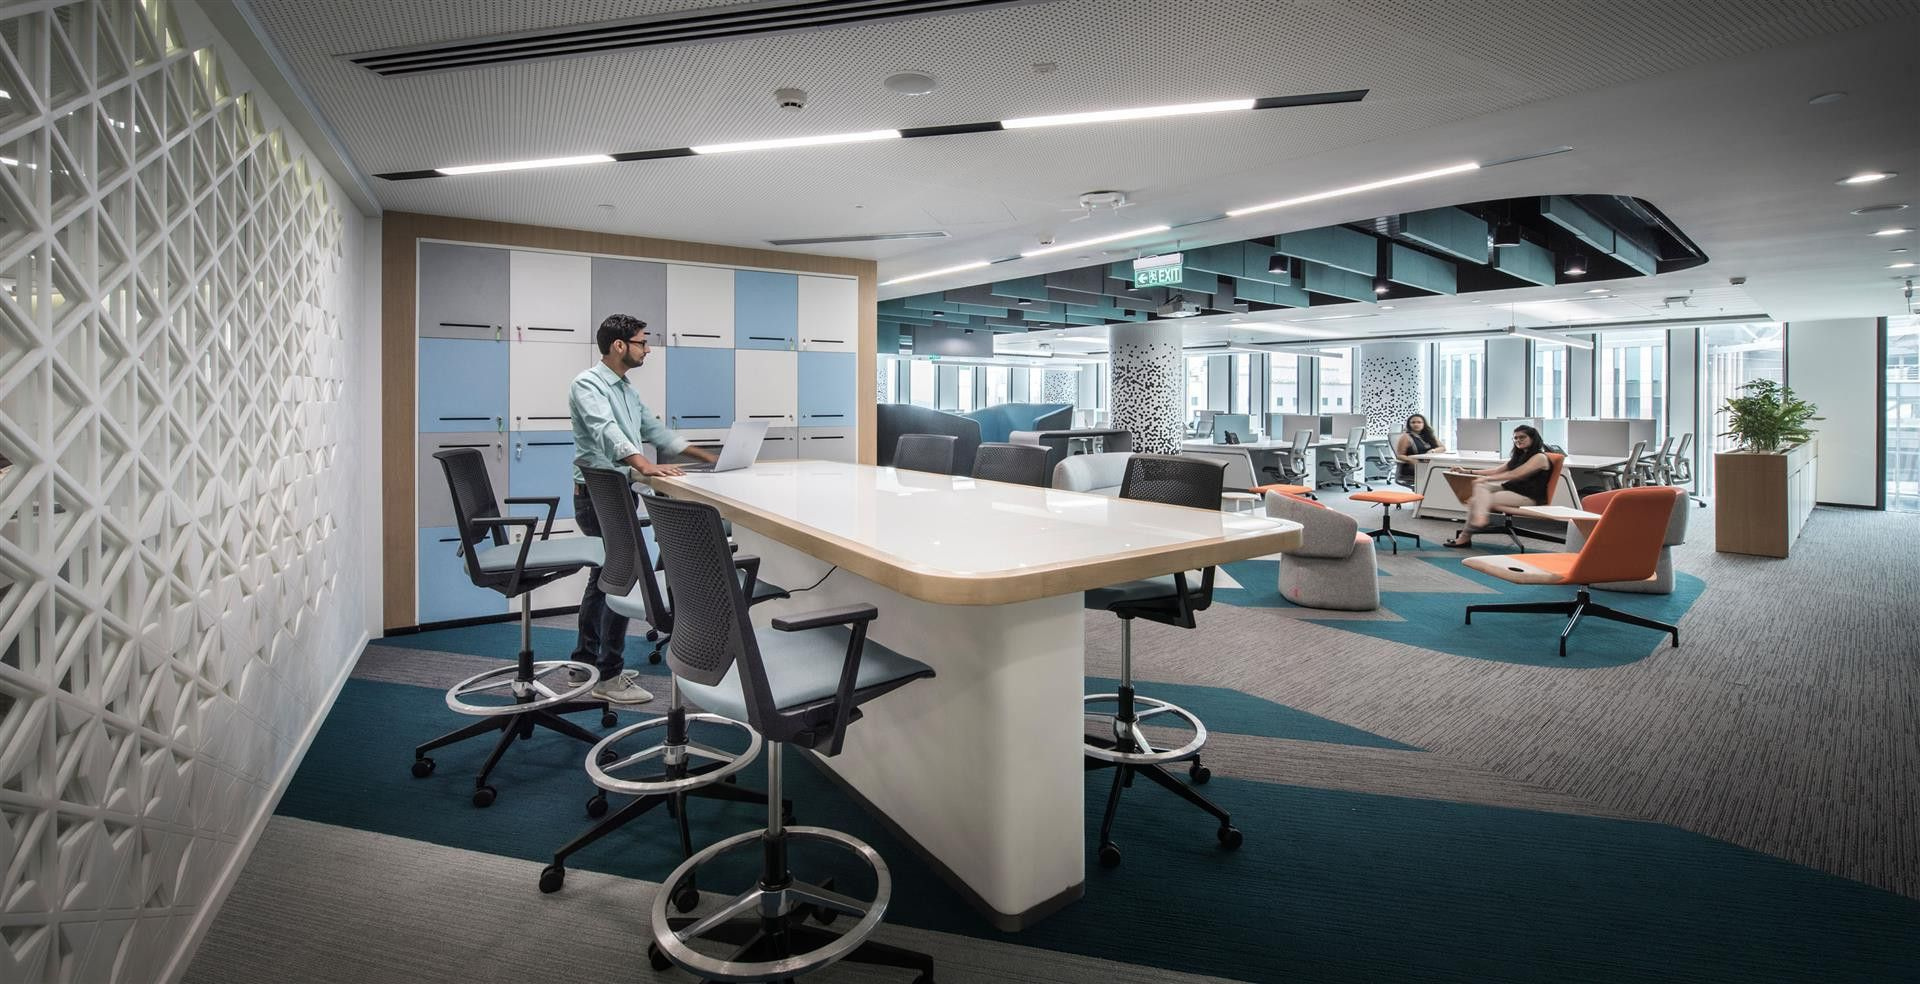 Office Workspace Design Office Space Interior Design Find The